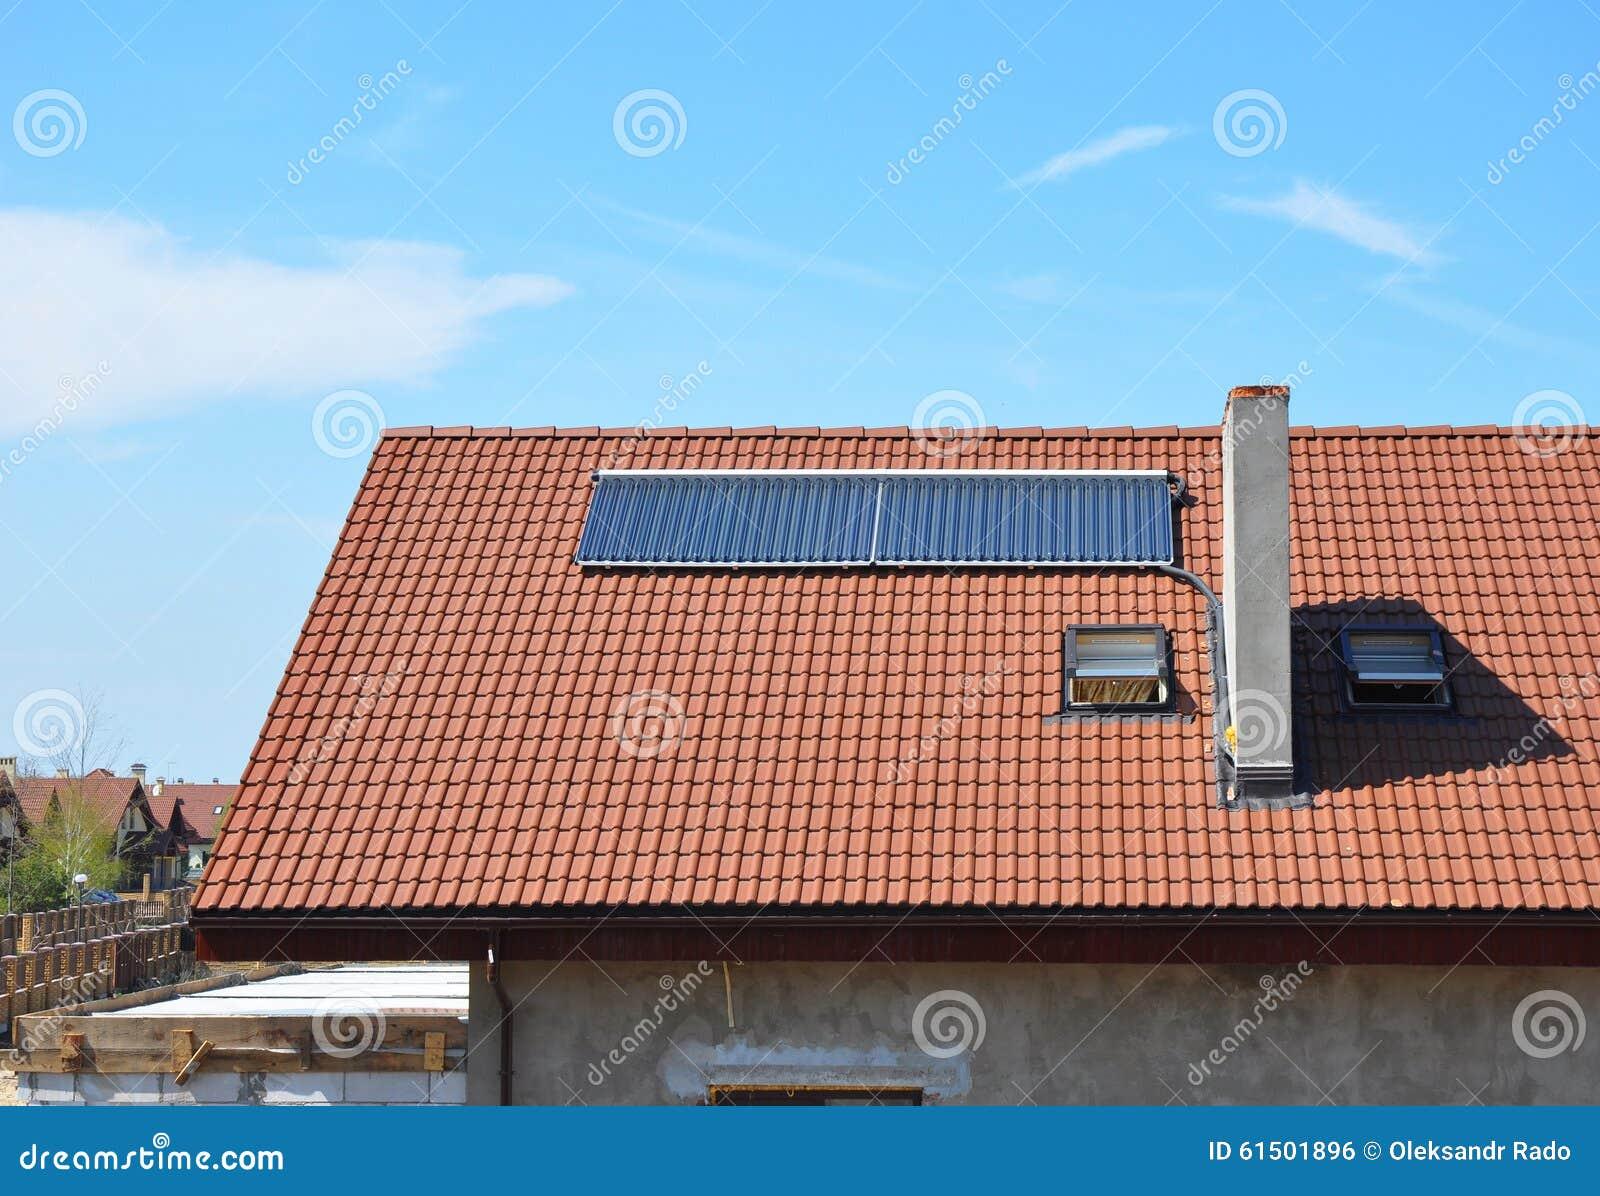 Energy efficiency new passive house building concept for Building a passive solar home